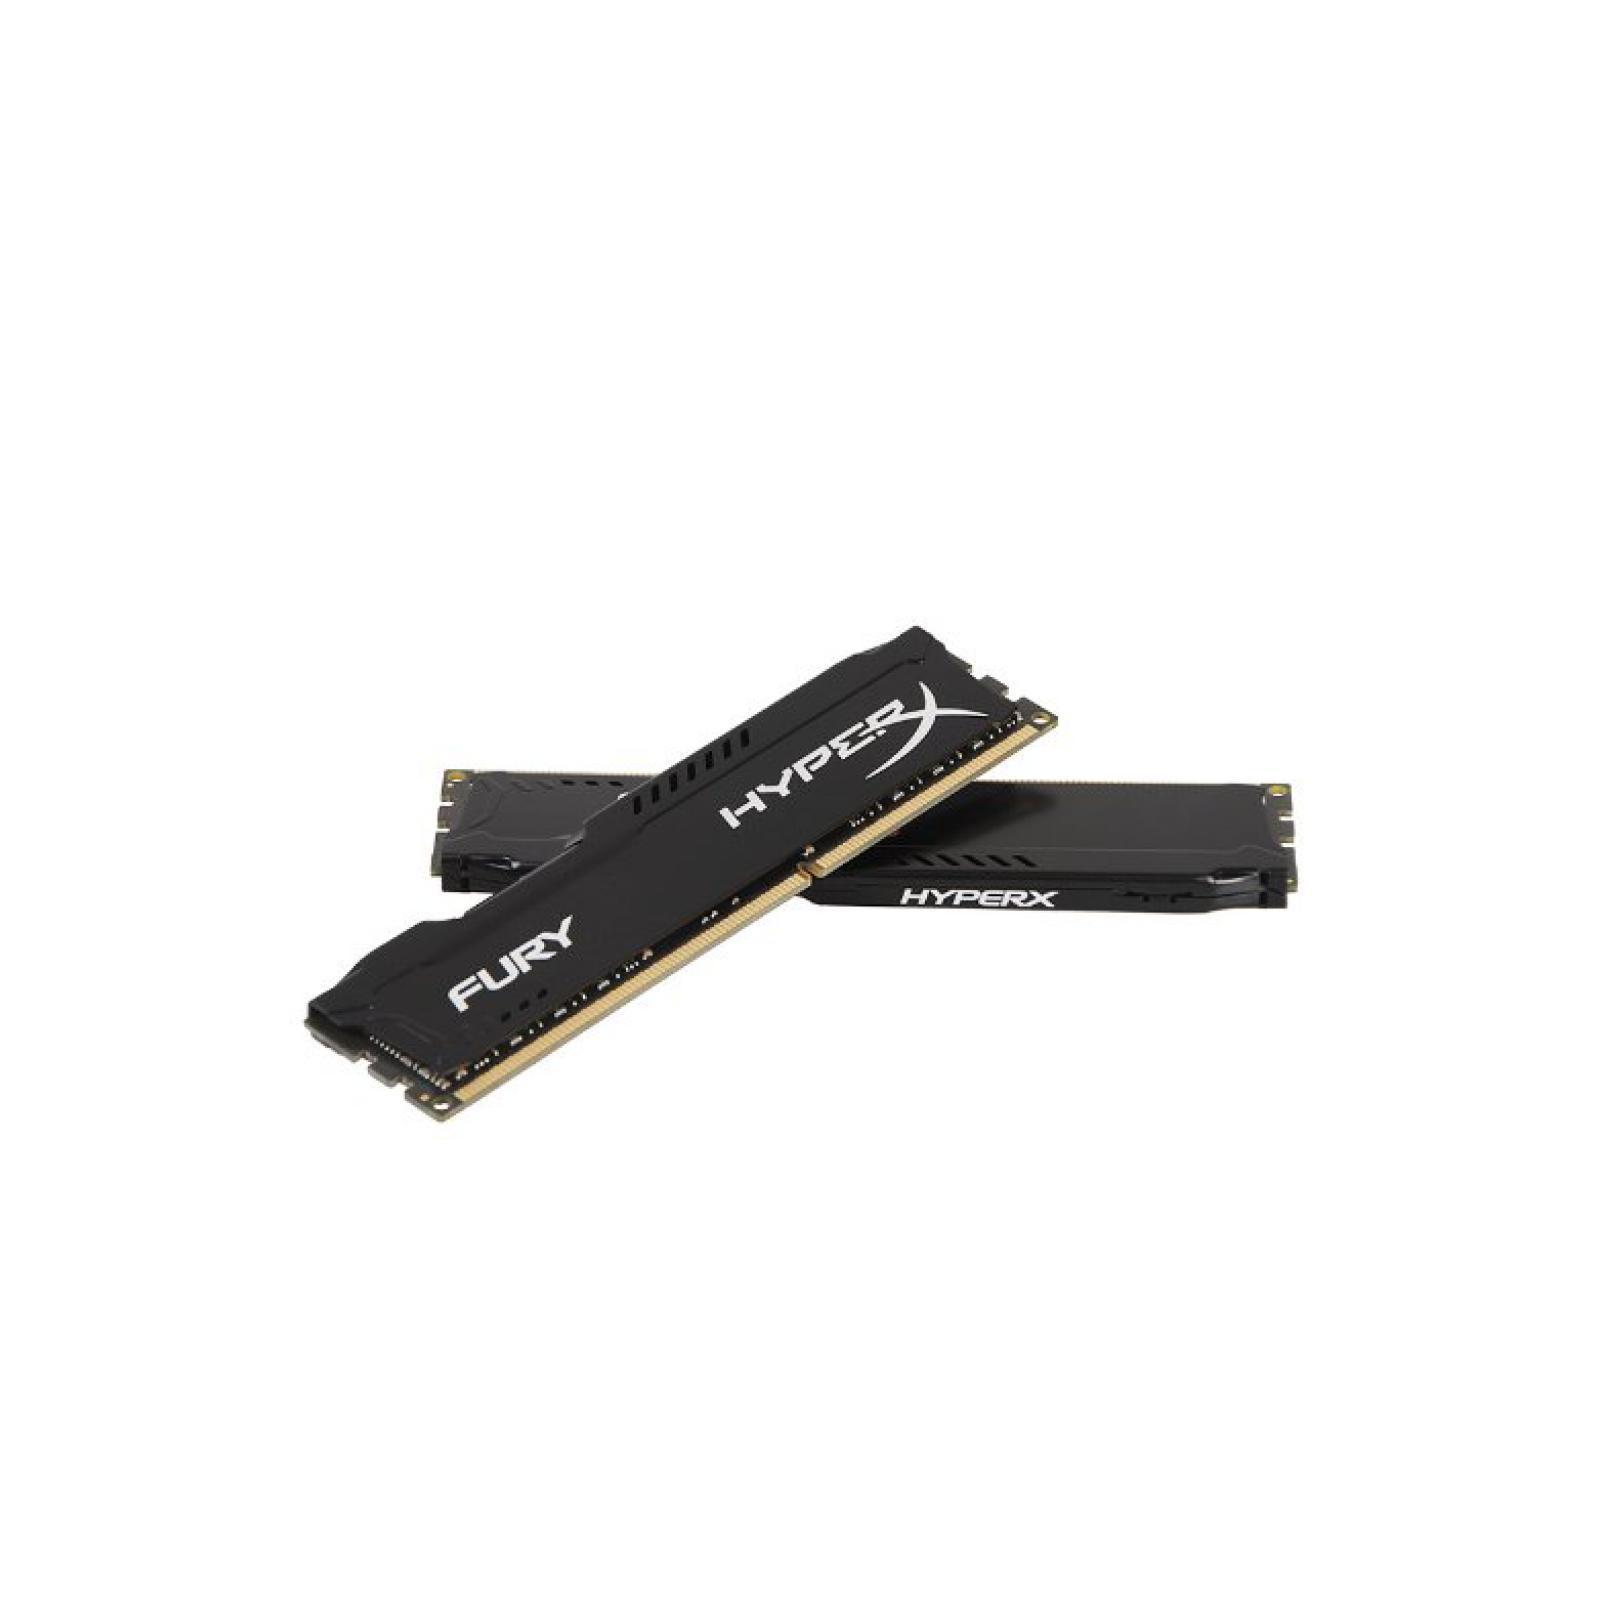 Модуль памяти для компьютера DDR4 32GB (2x16GB) 2933 MHz HyperX FURY Black HyperX (Kingston Fury) (HX429C17FBK2/32) изображение 4